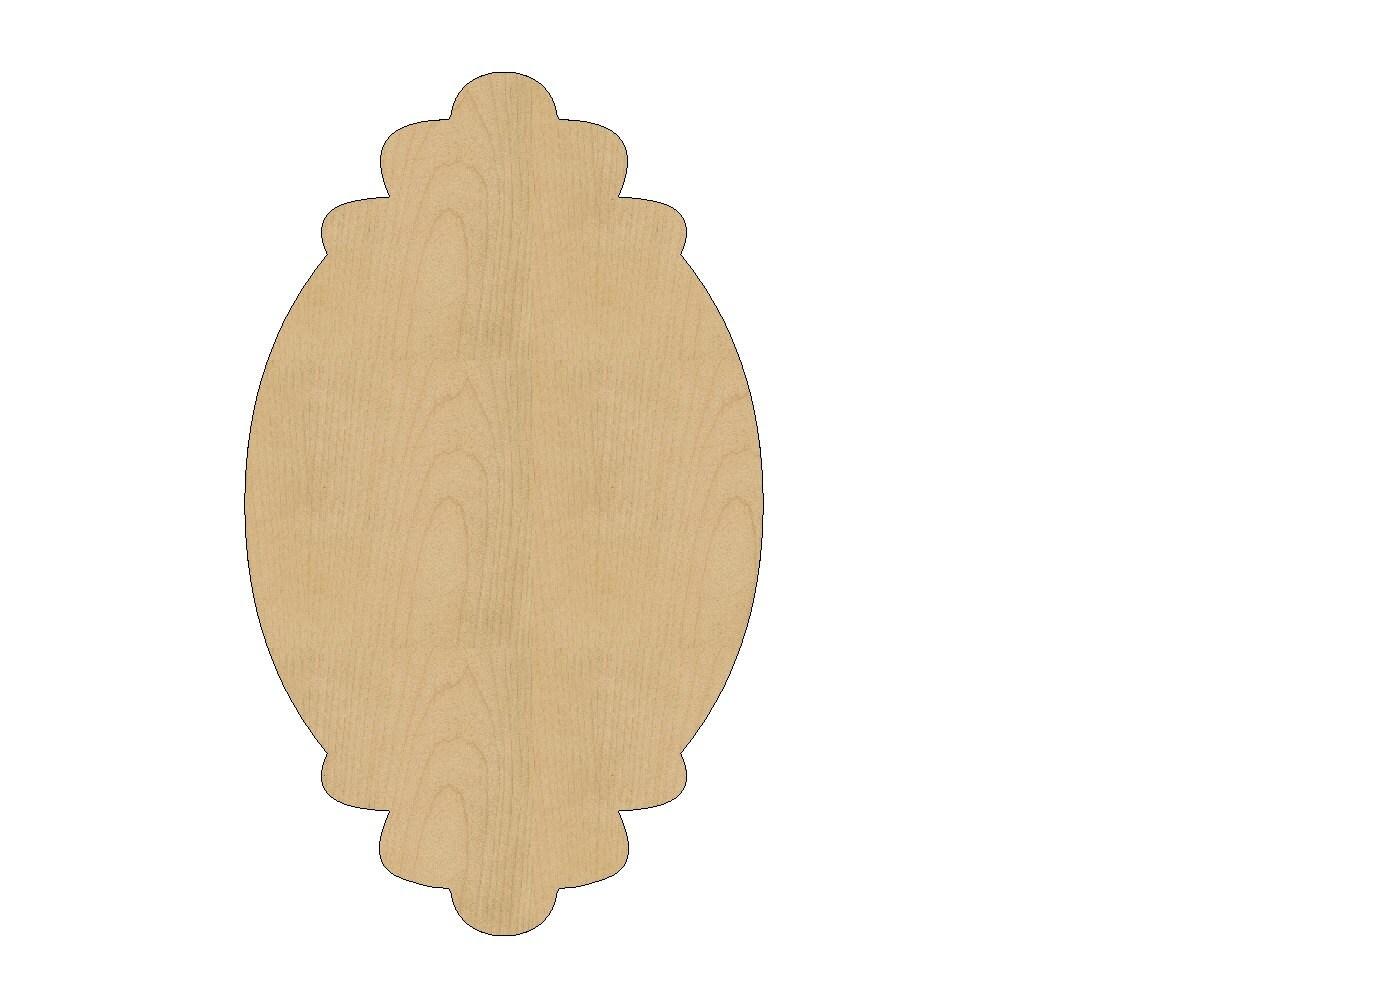 Oval Frame Cutout Shape Laser Cut Unfinished Wood Shapes